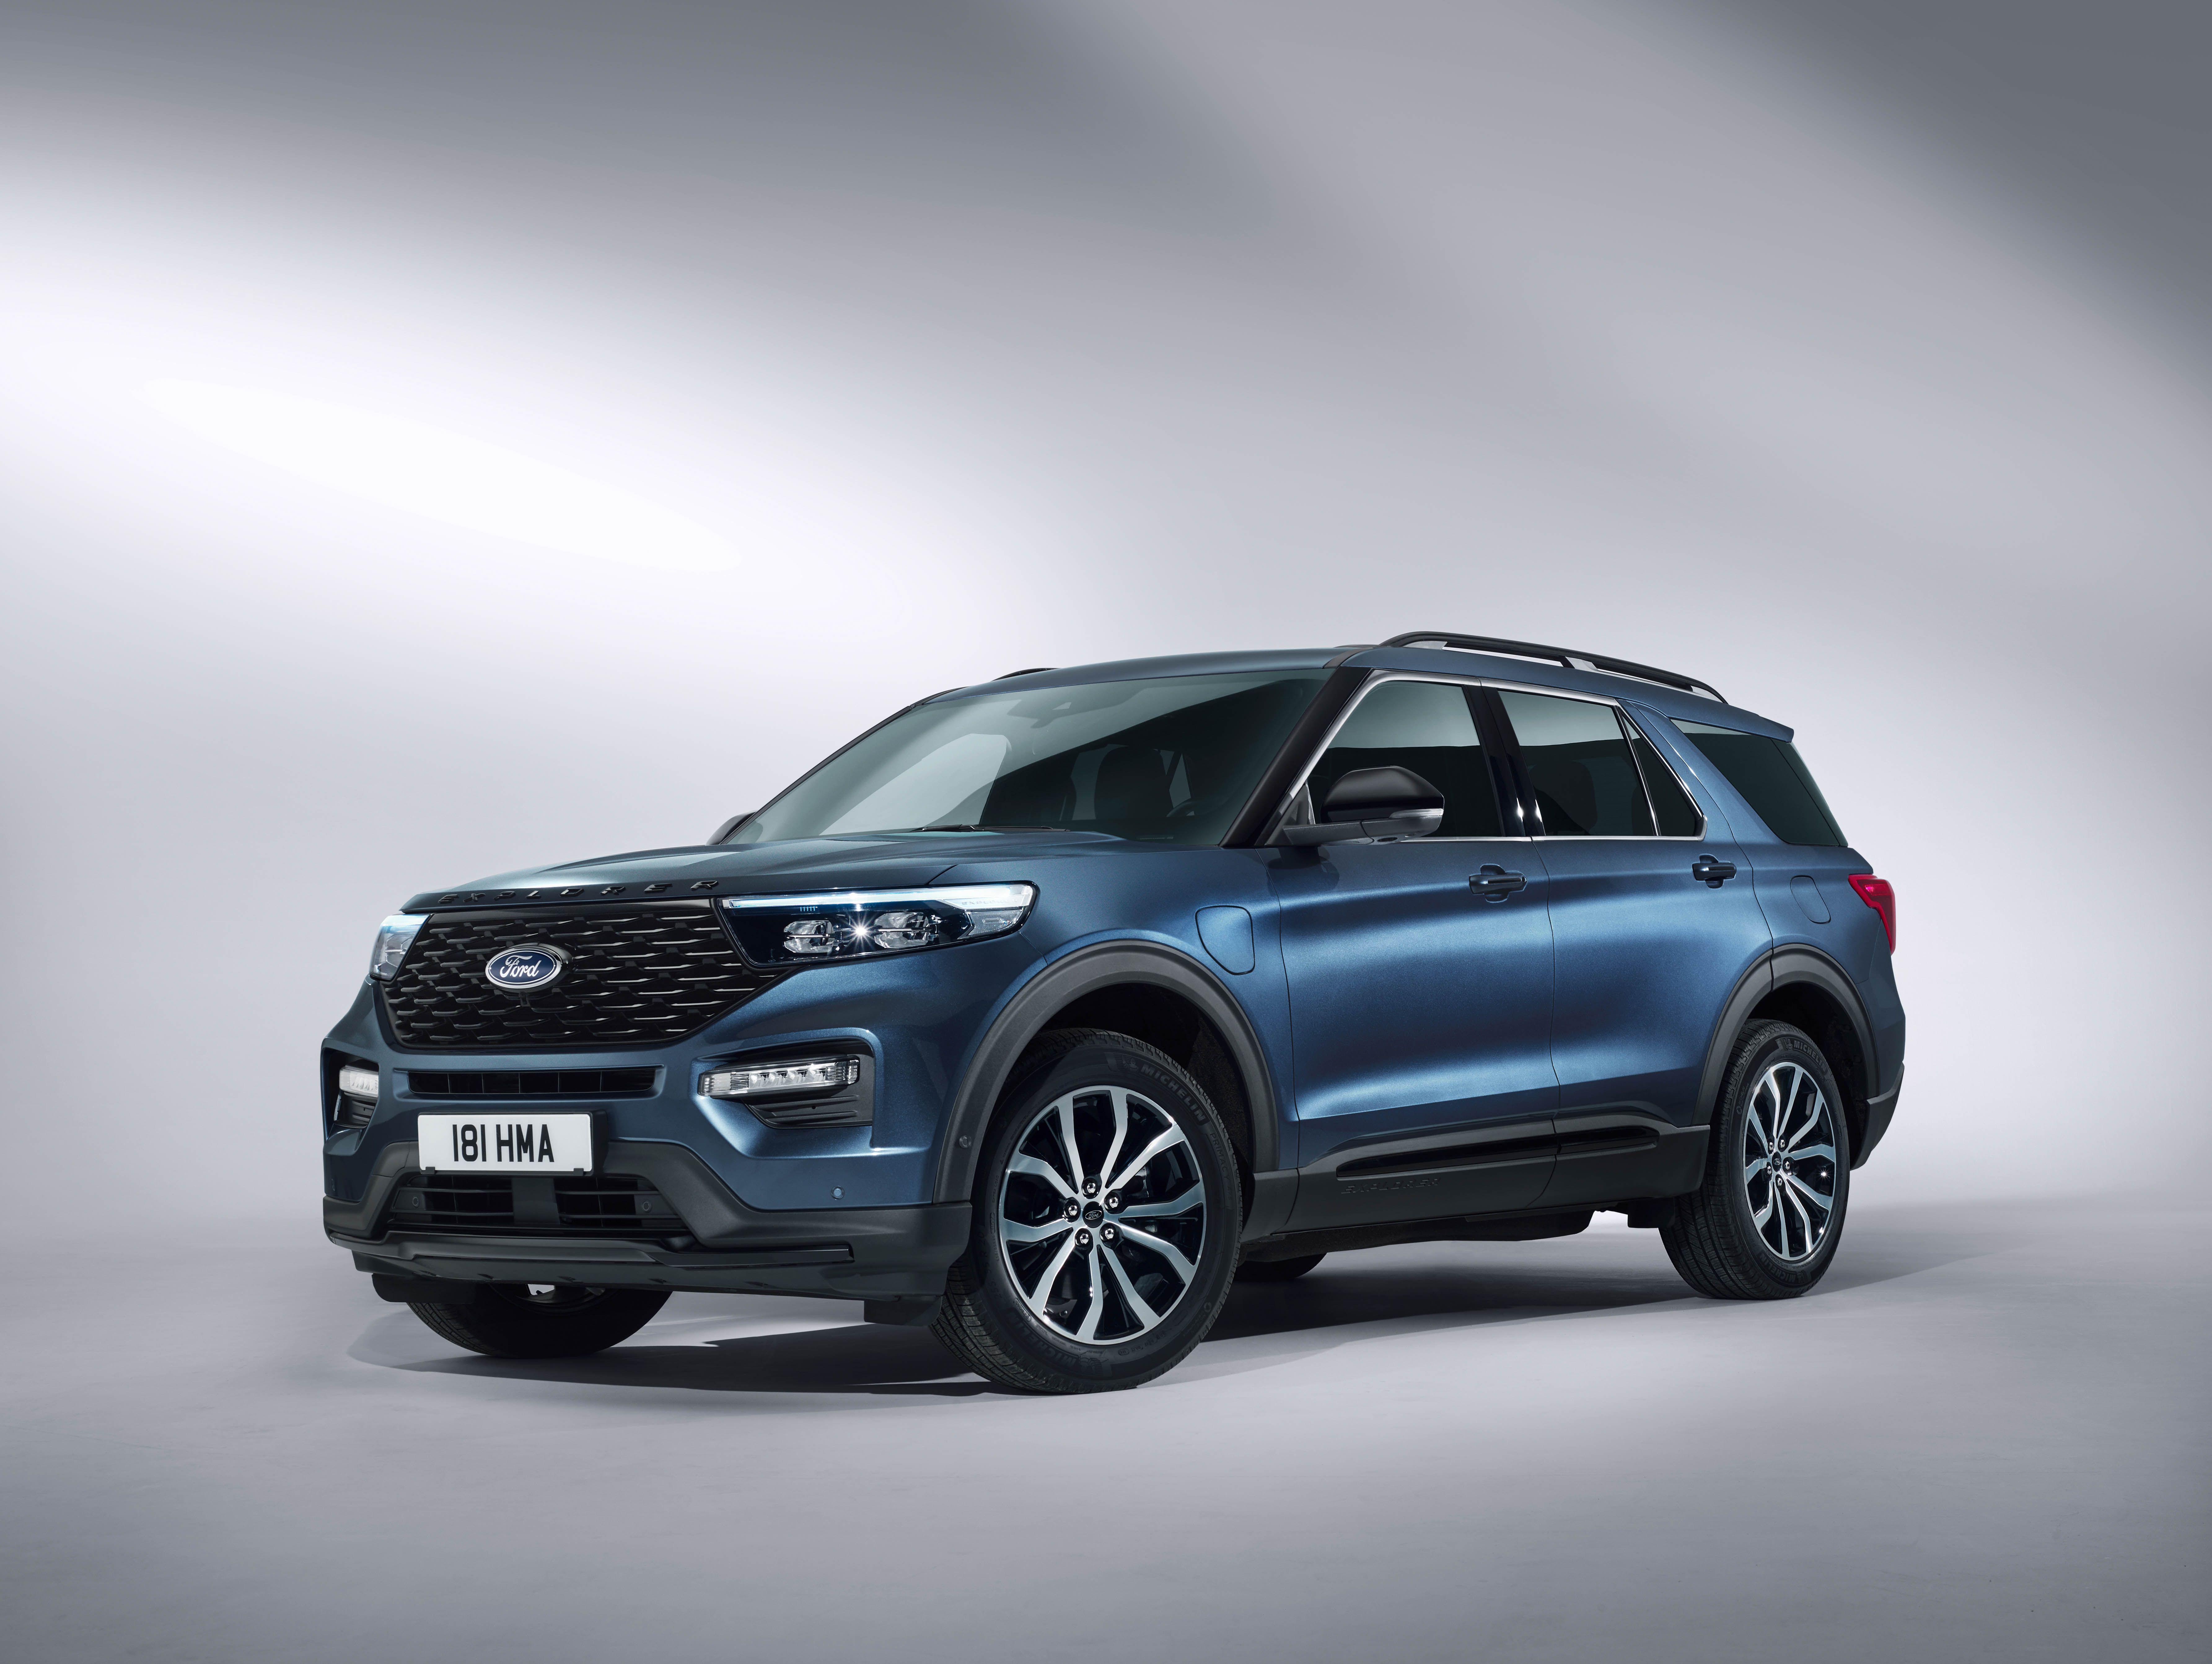 Ford Hybrid Suv >> Ford Explorer Plug In Hybrid New Phev Suv For Europe